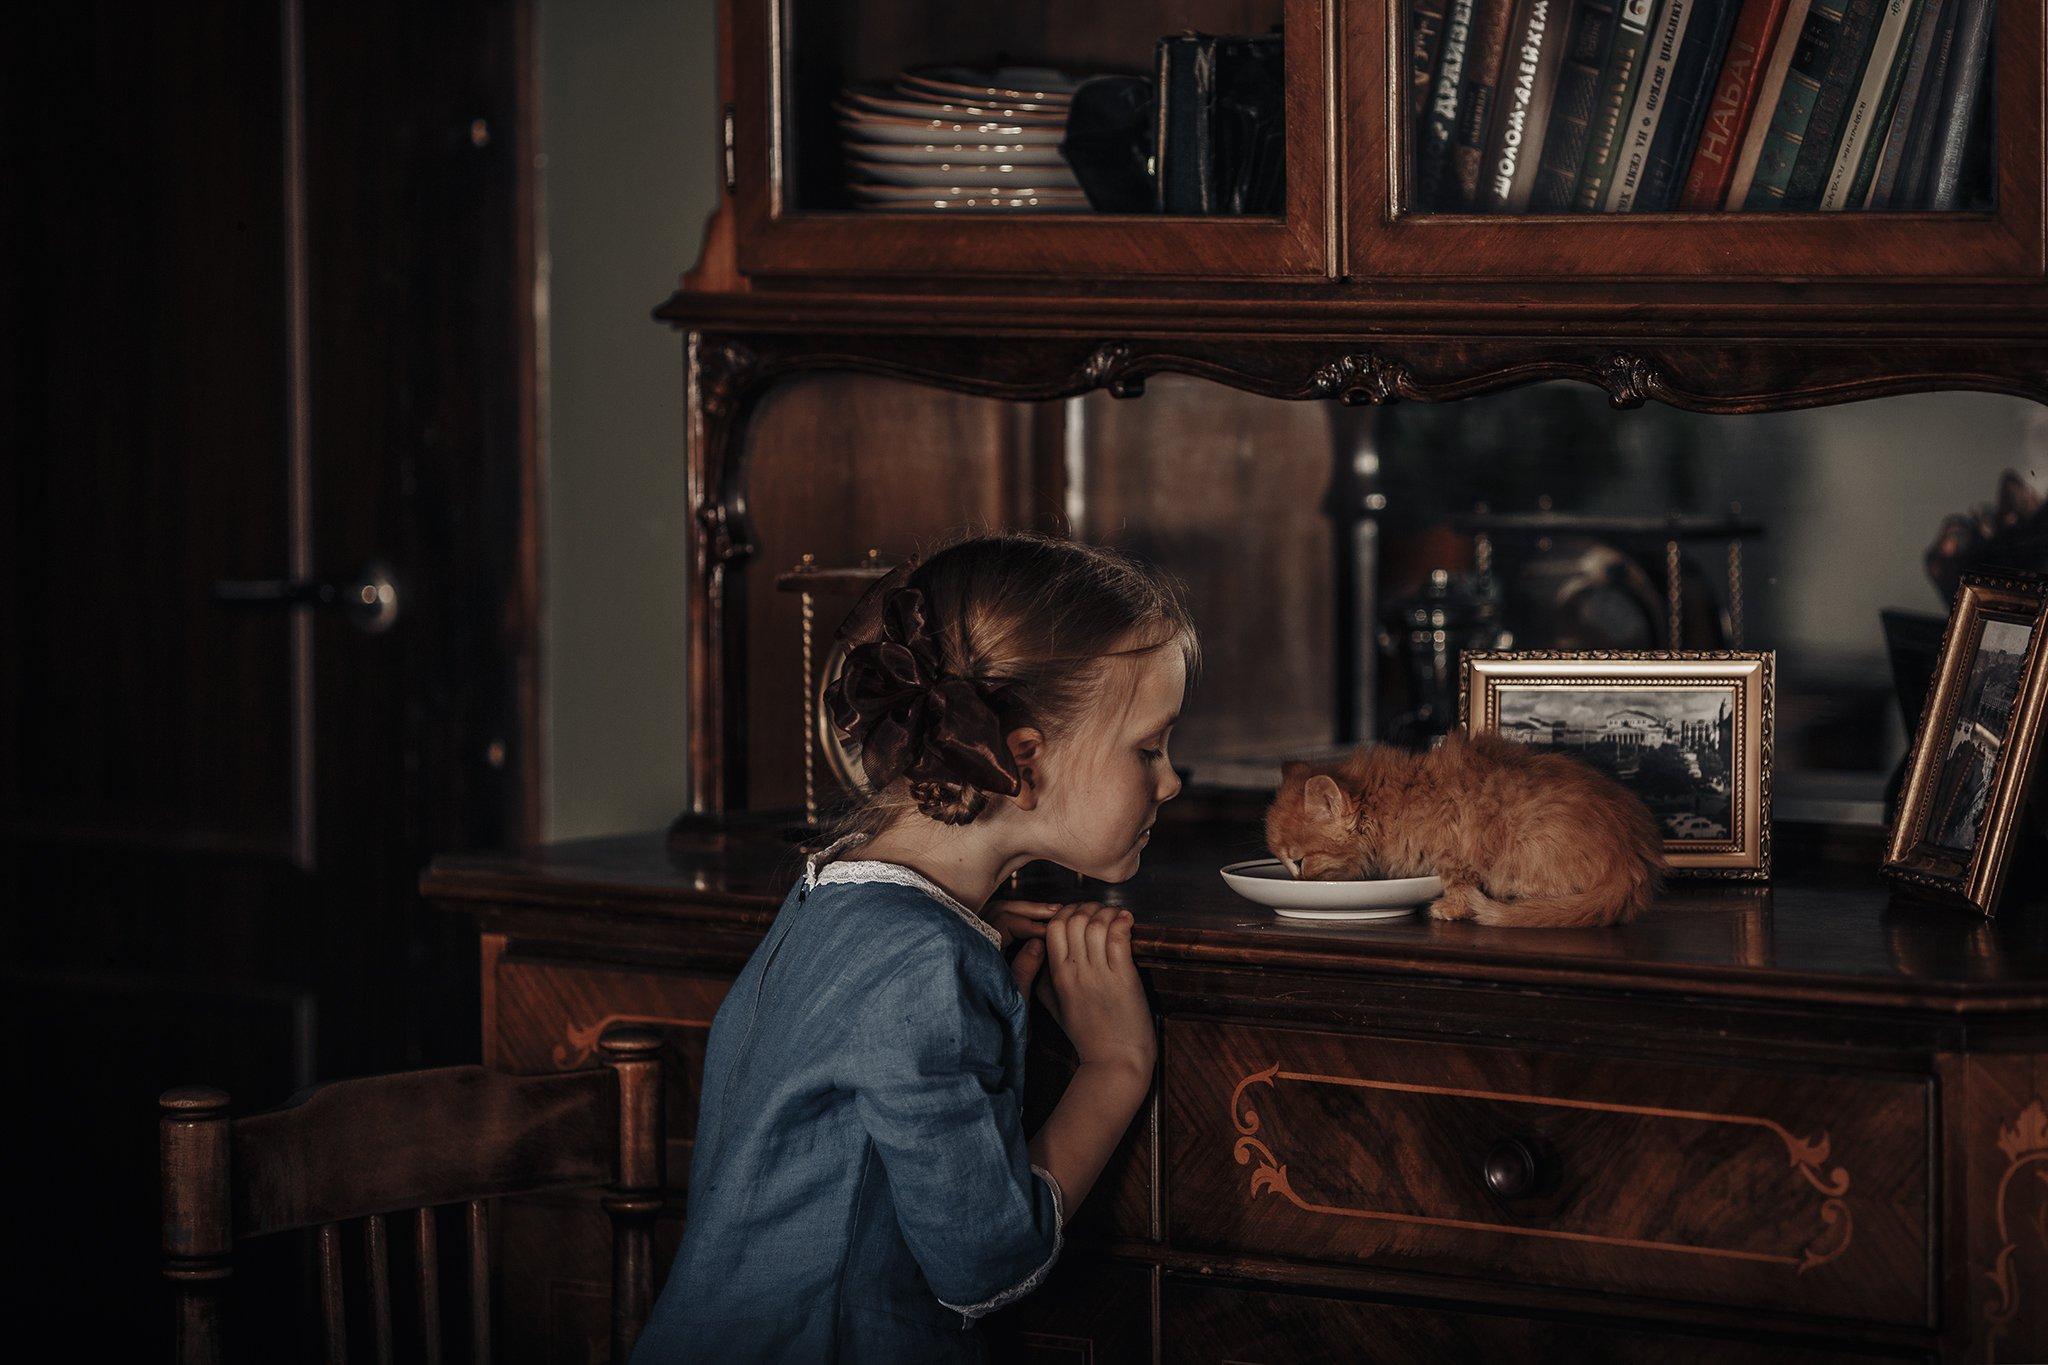 ретро, котенок, молоко, девочка. ребенок, ссср, Марина Петра